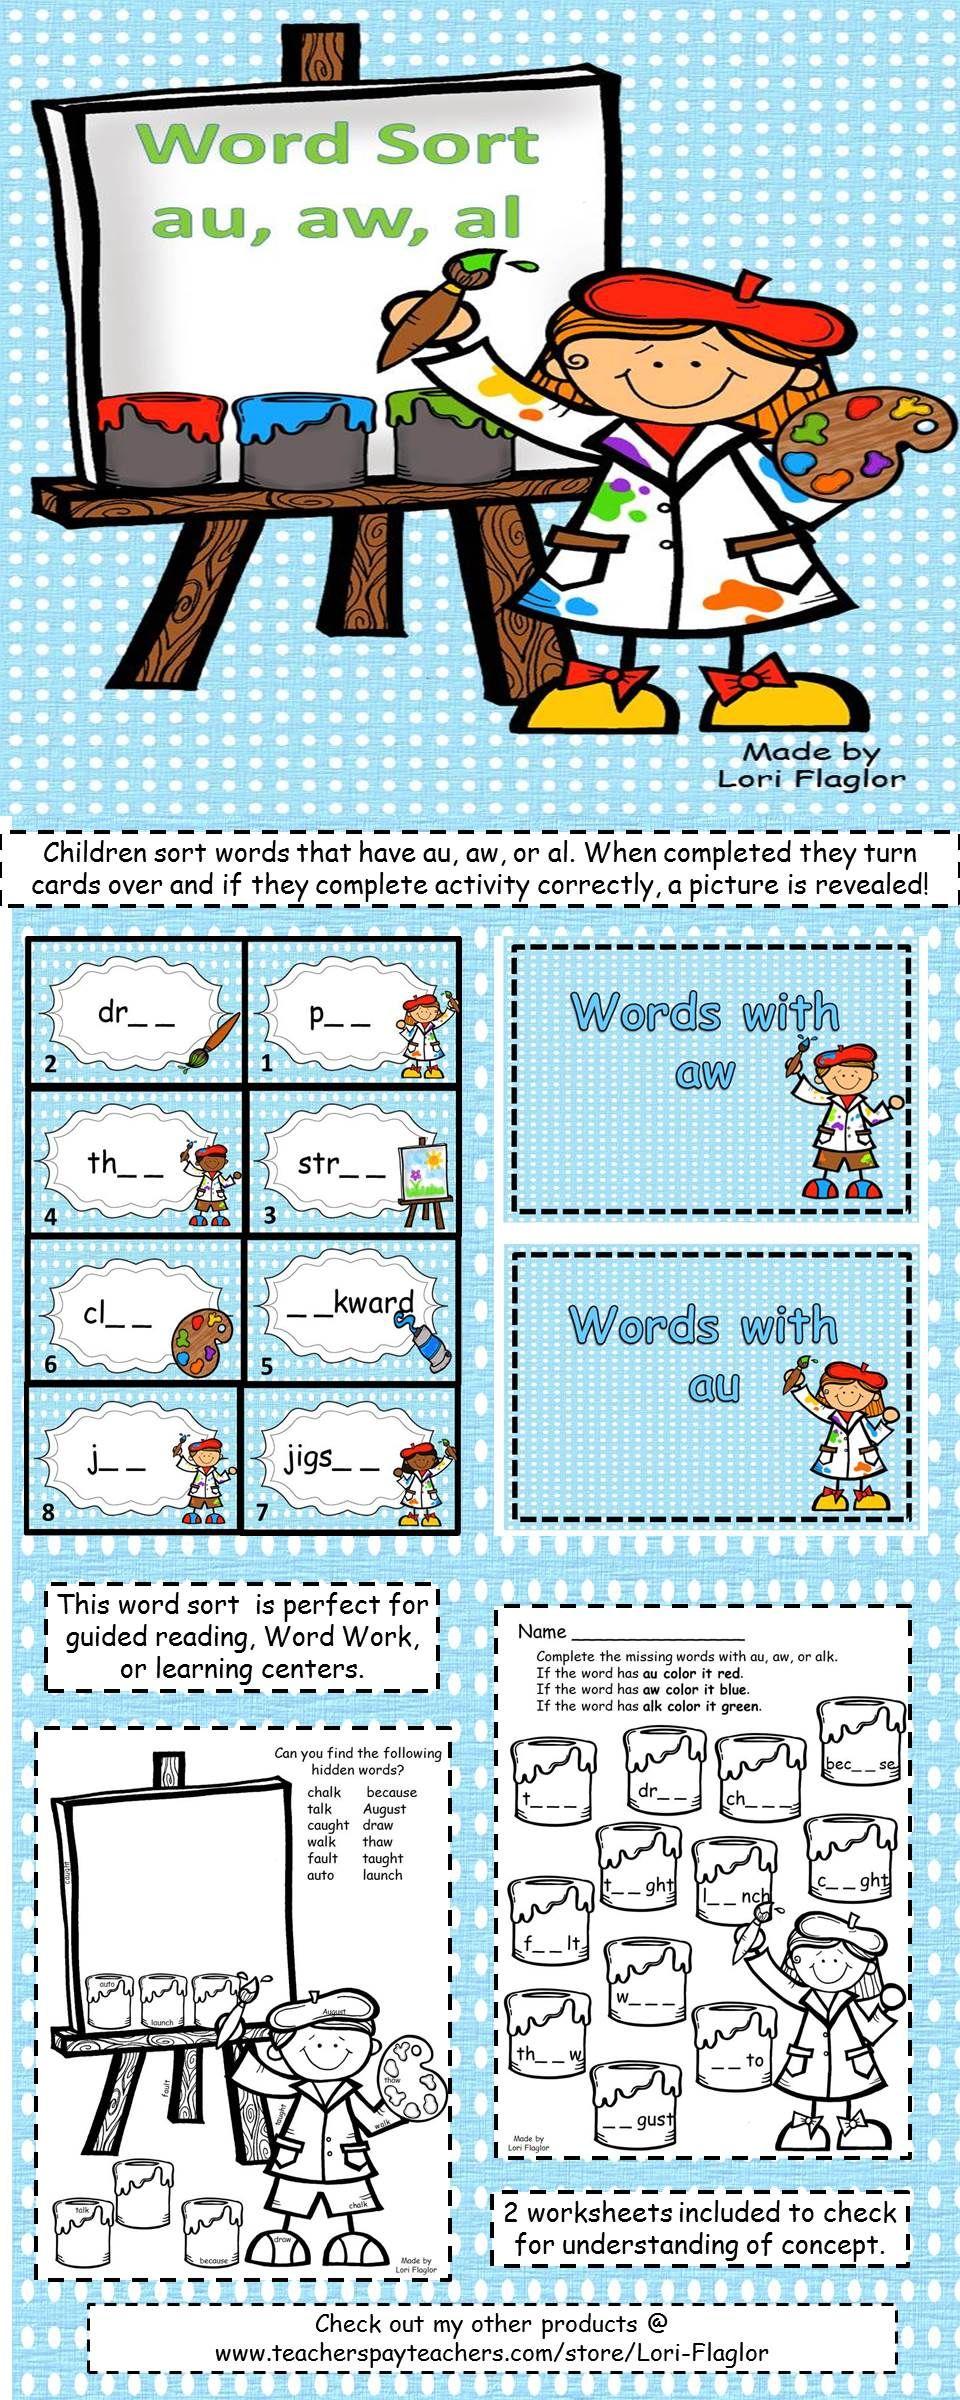 au, aw, al Word Sort | Daily 5 | Pinterest | Language arts, Language ...